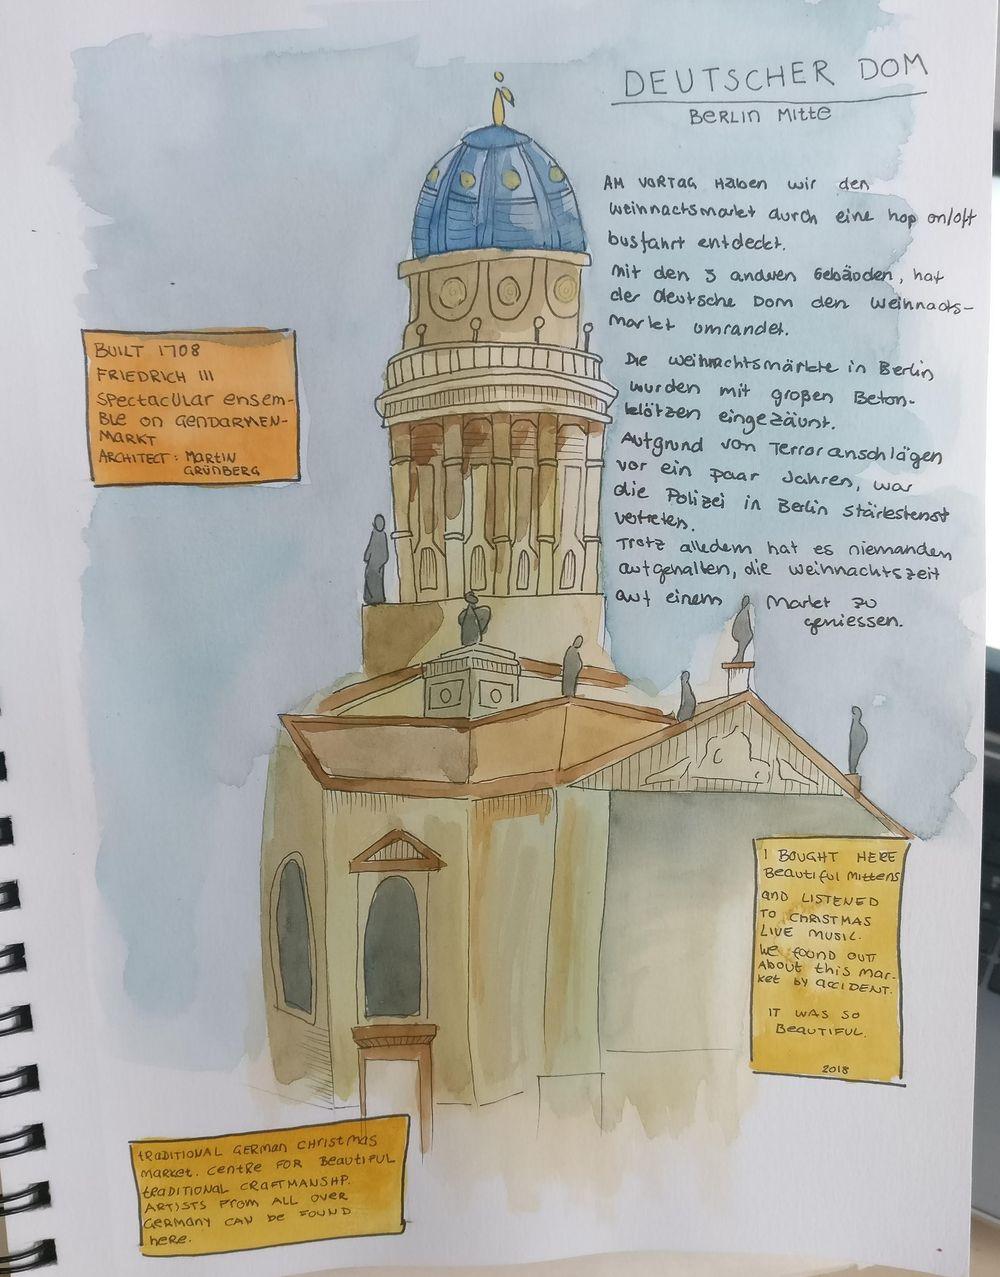 Composition I (Hero Image), II (Roadmap) and III (Collage) - image 1 - student project